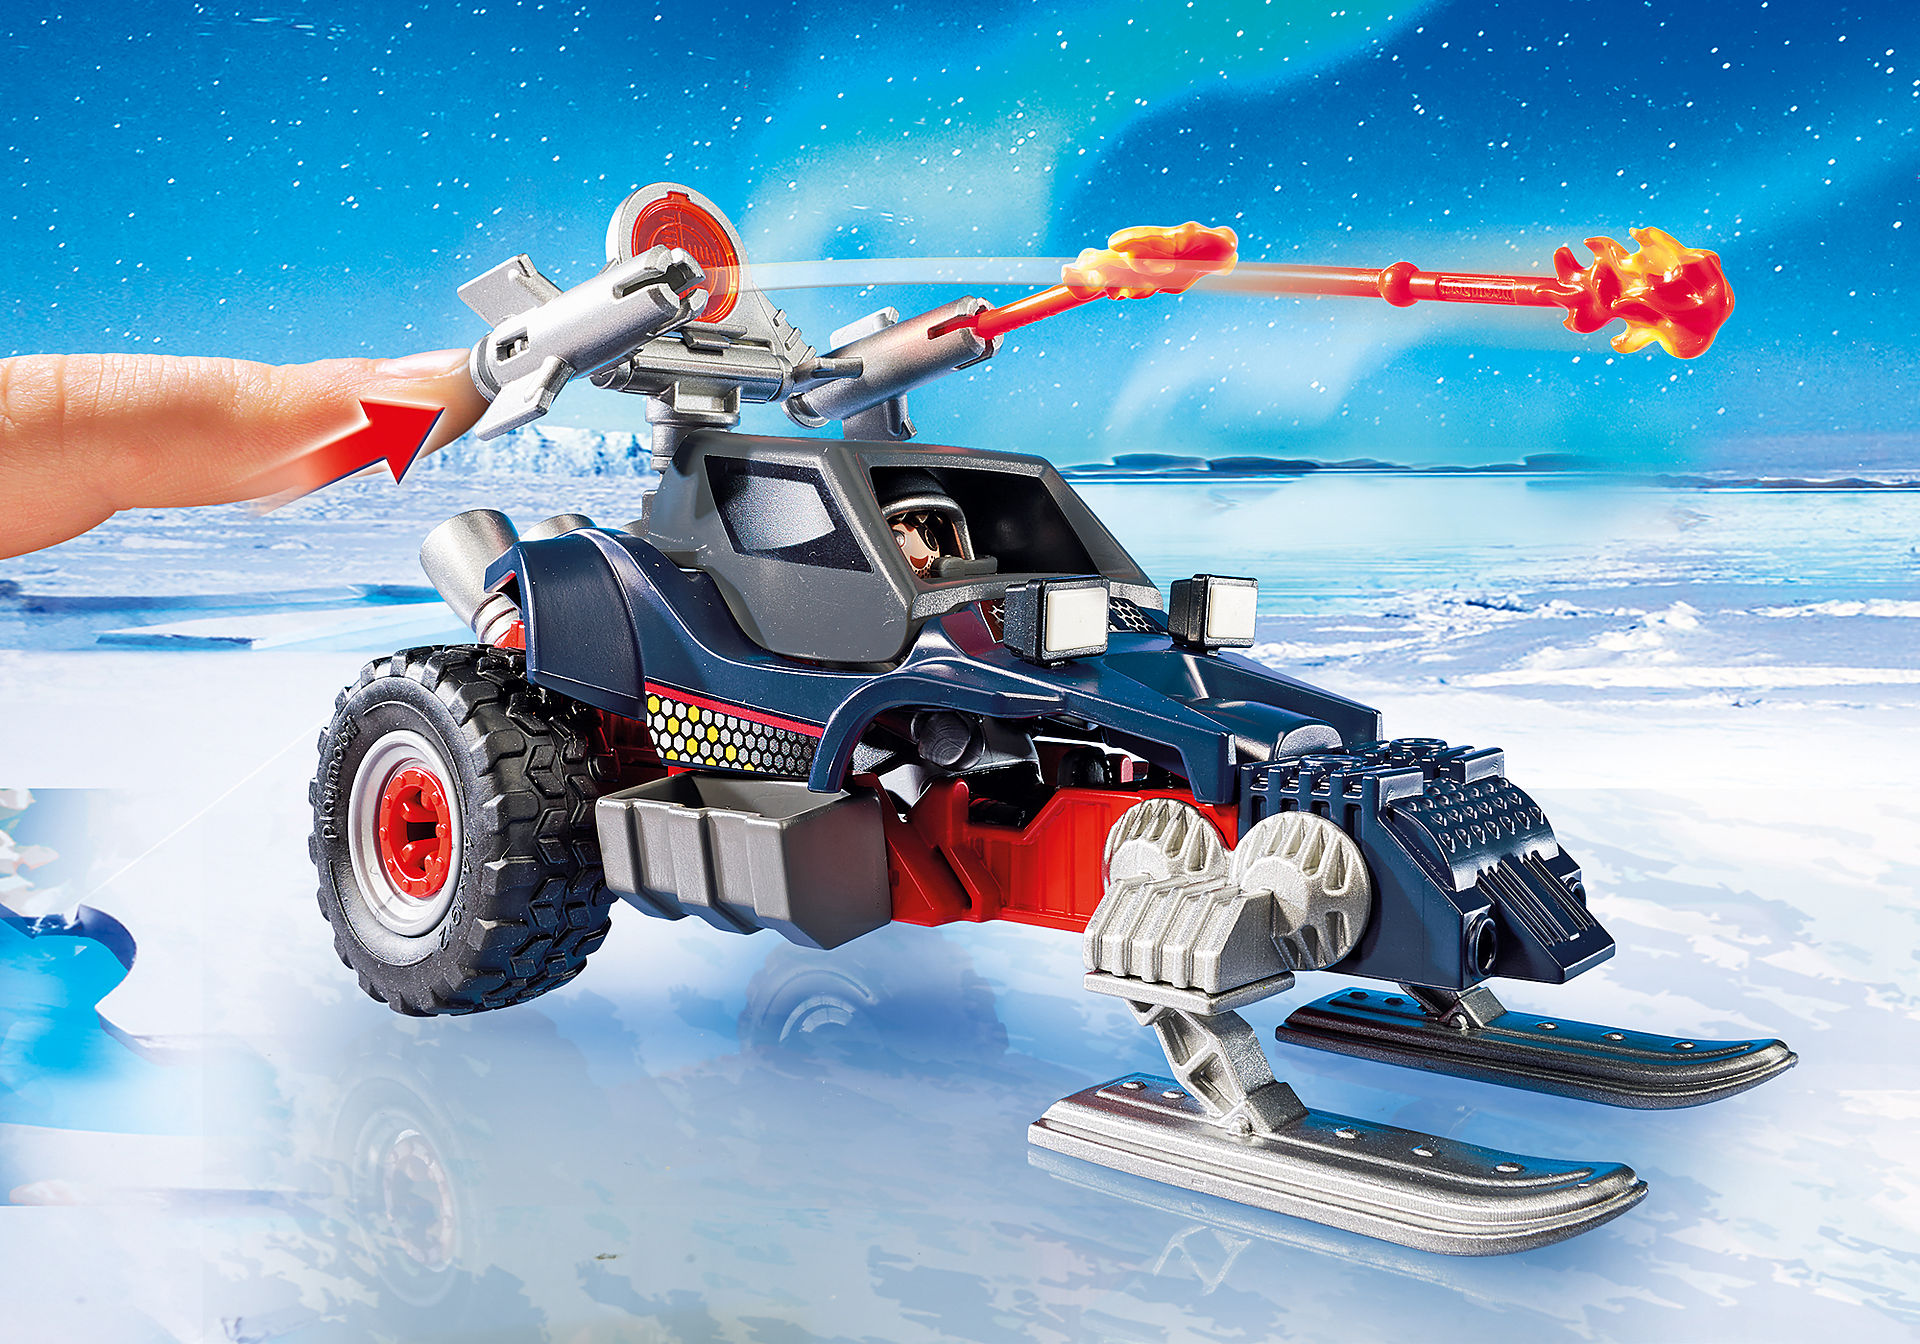 http://media.playmobil.com/i/playmobil/9058_product_extra2/Sneeuwscooter met ijspiraat